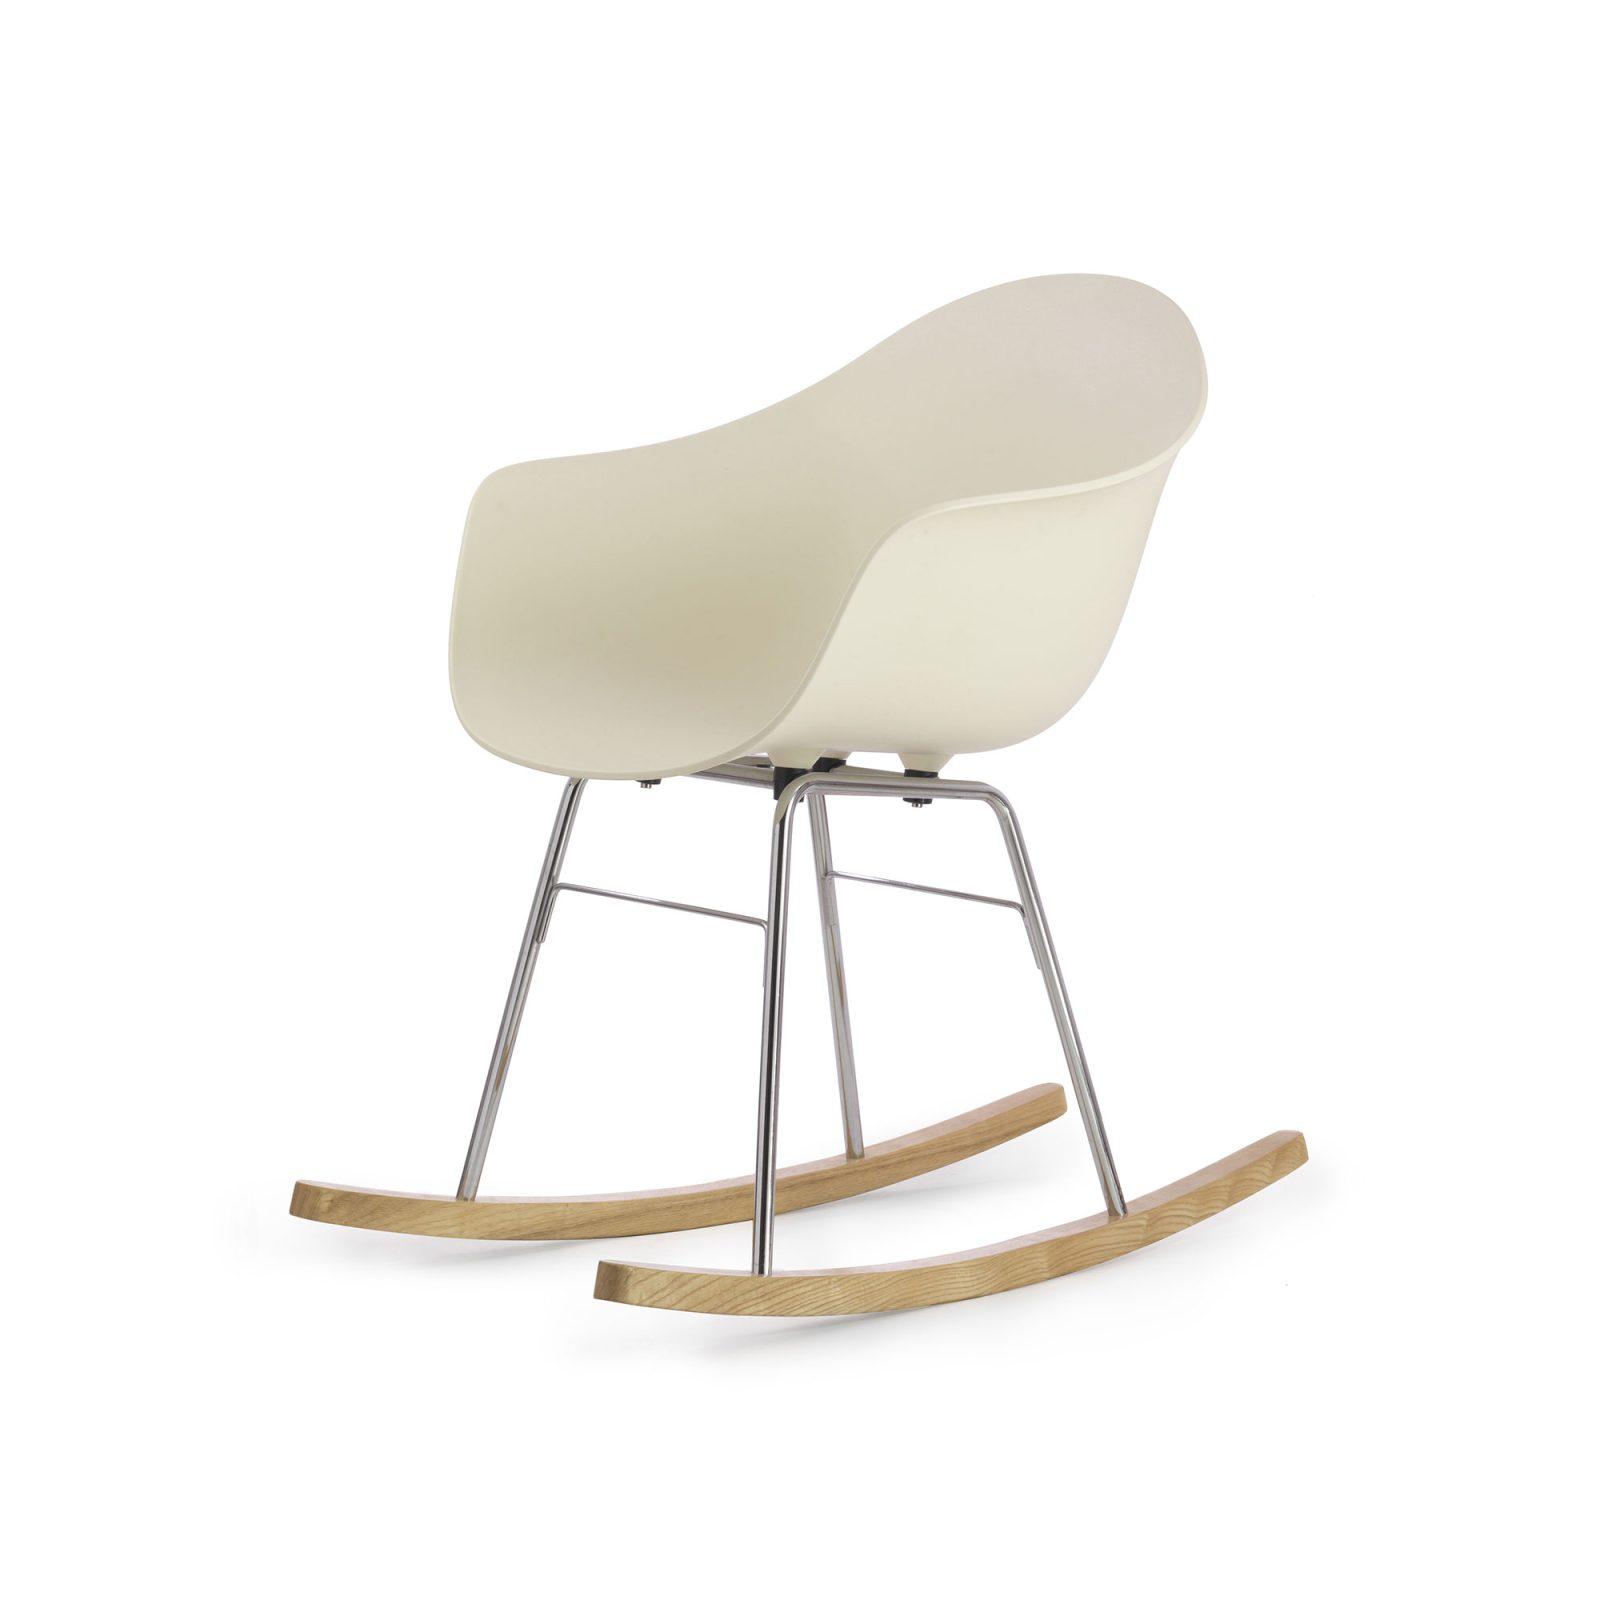 ta-rocking-chair-cream-seat-5